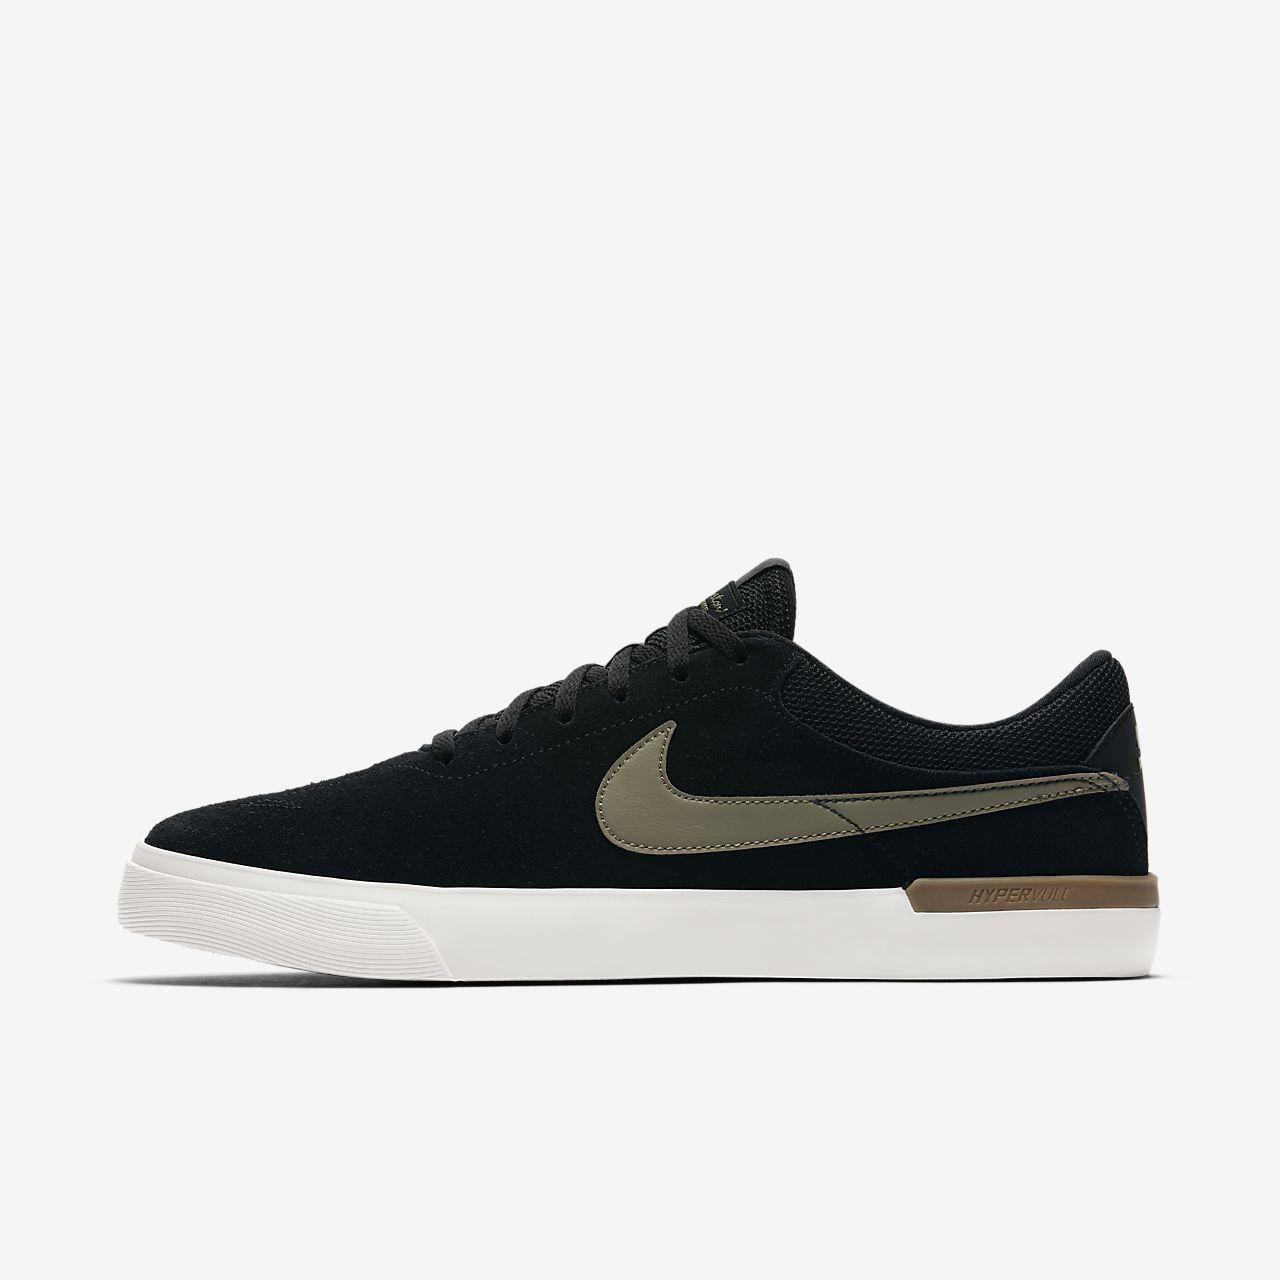 Hombres Nike Sb Eric Koston Zoom Zapatos Bajos De Skate